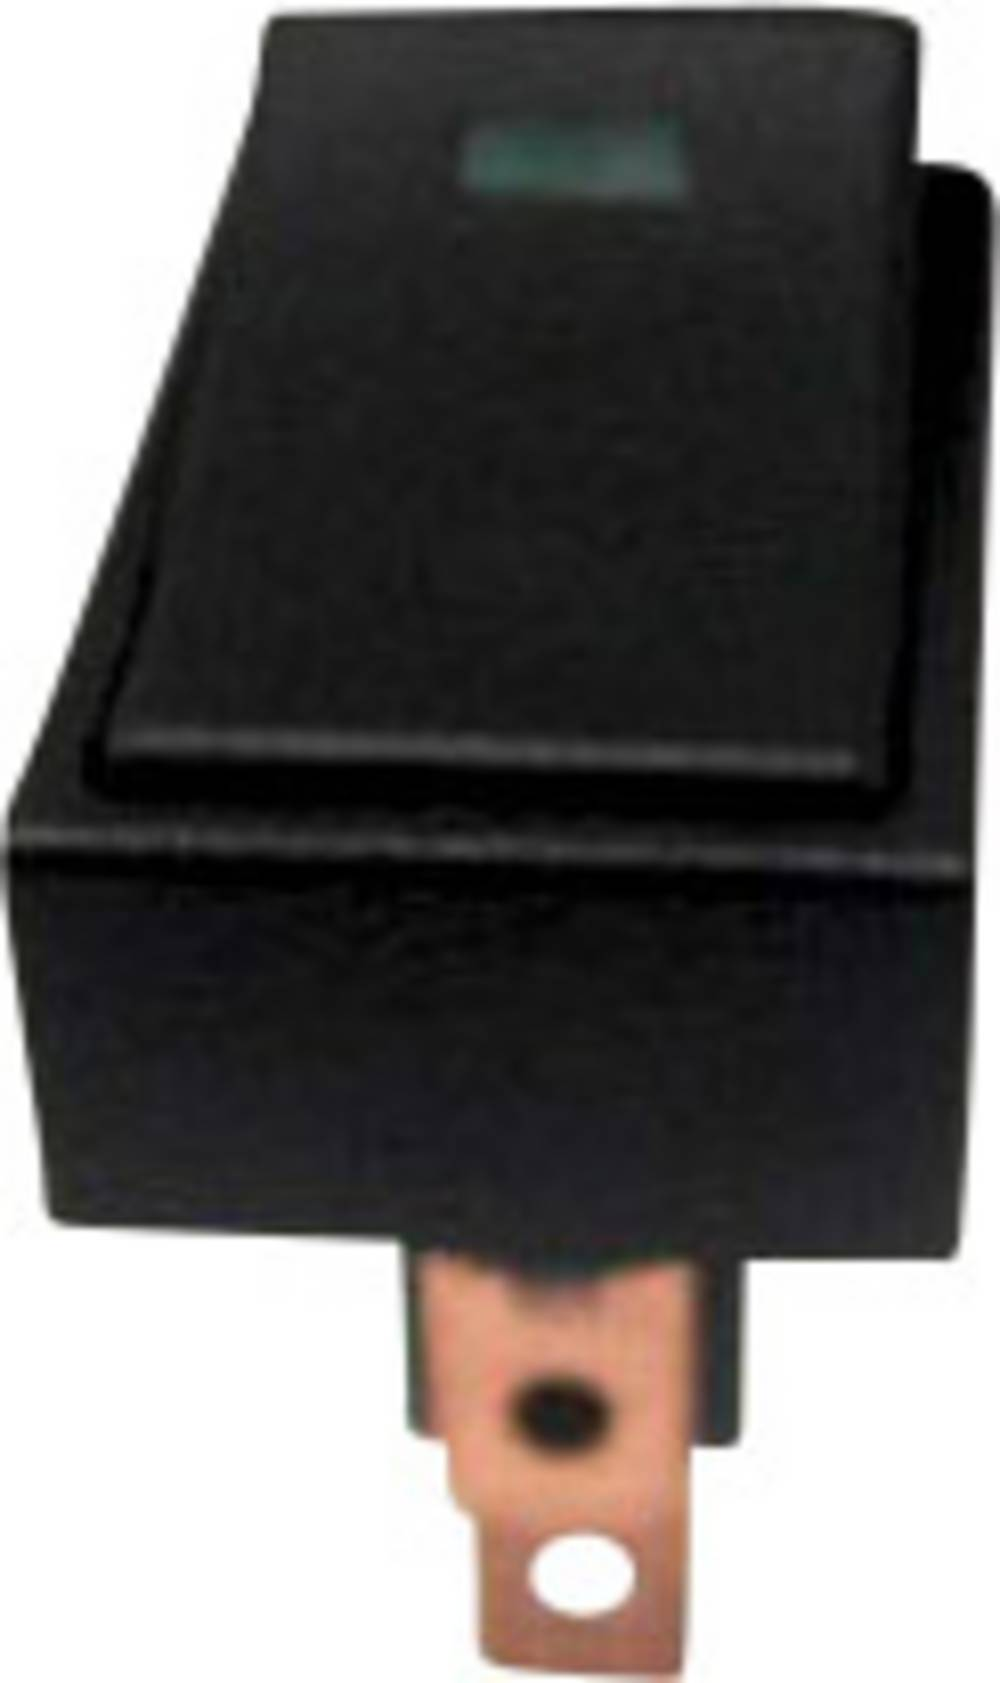 SCI Automobil-vippeomskifter 12 V/DC 25 A R13-207L-SQ N/A N/A LED grøn (U B  12 V)